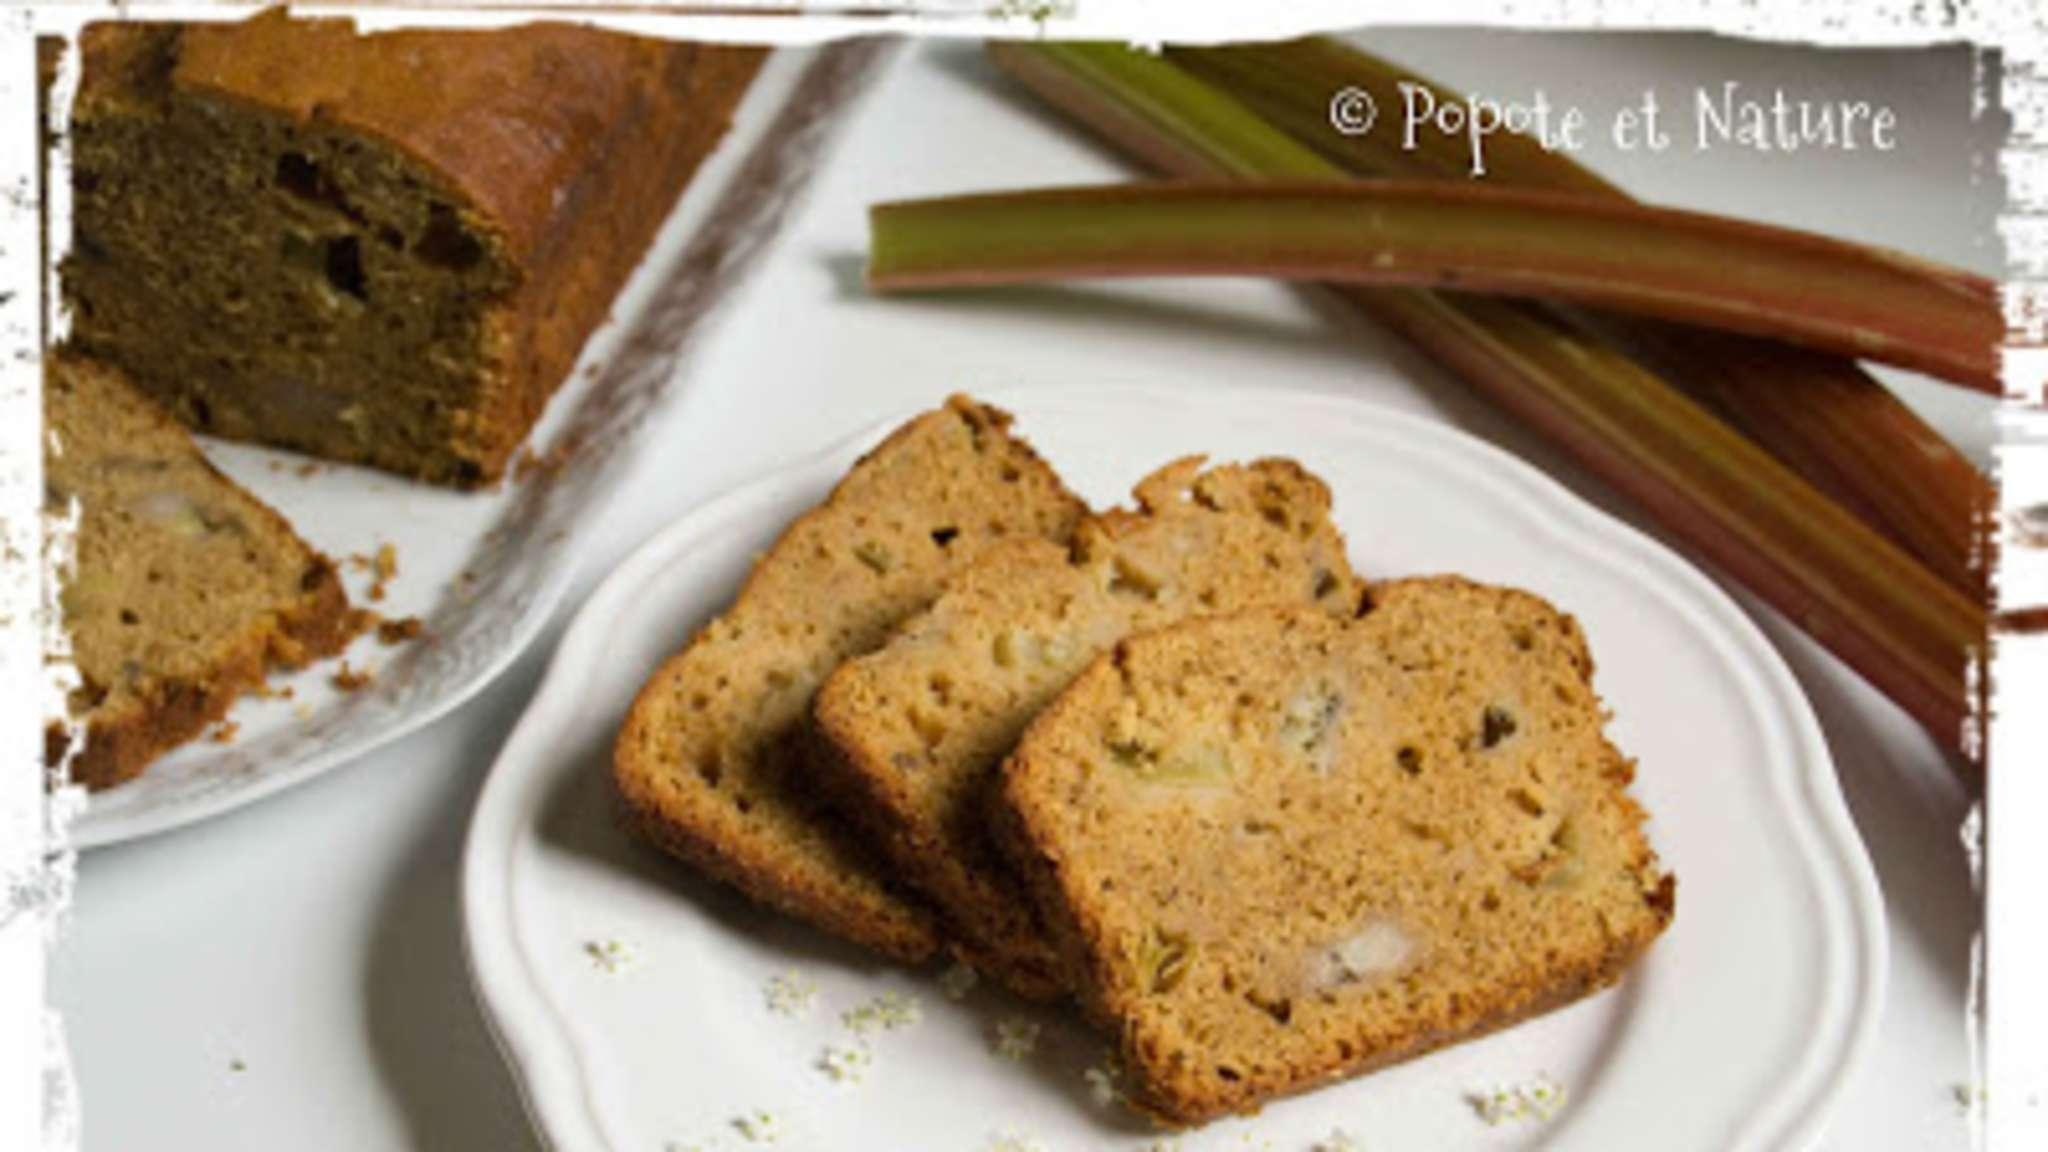 Banana bread à la rhubarbe vanillée